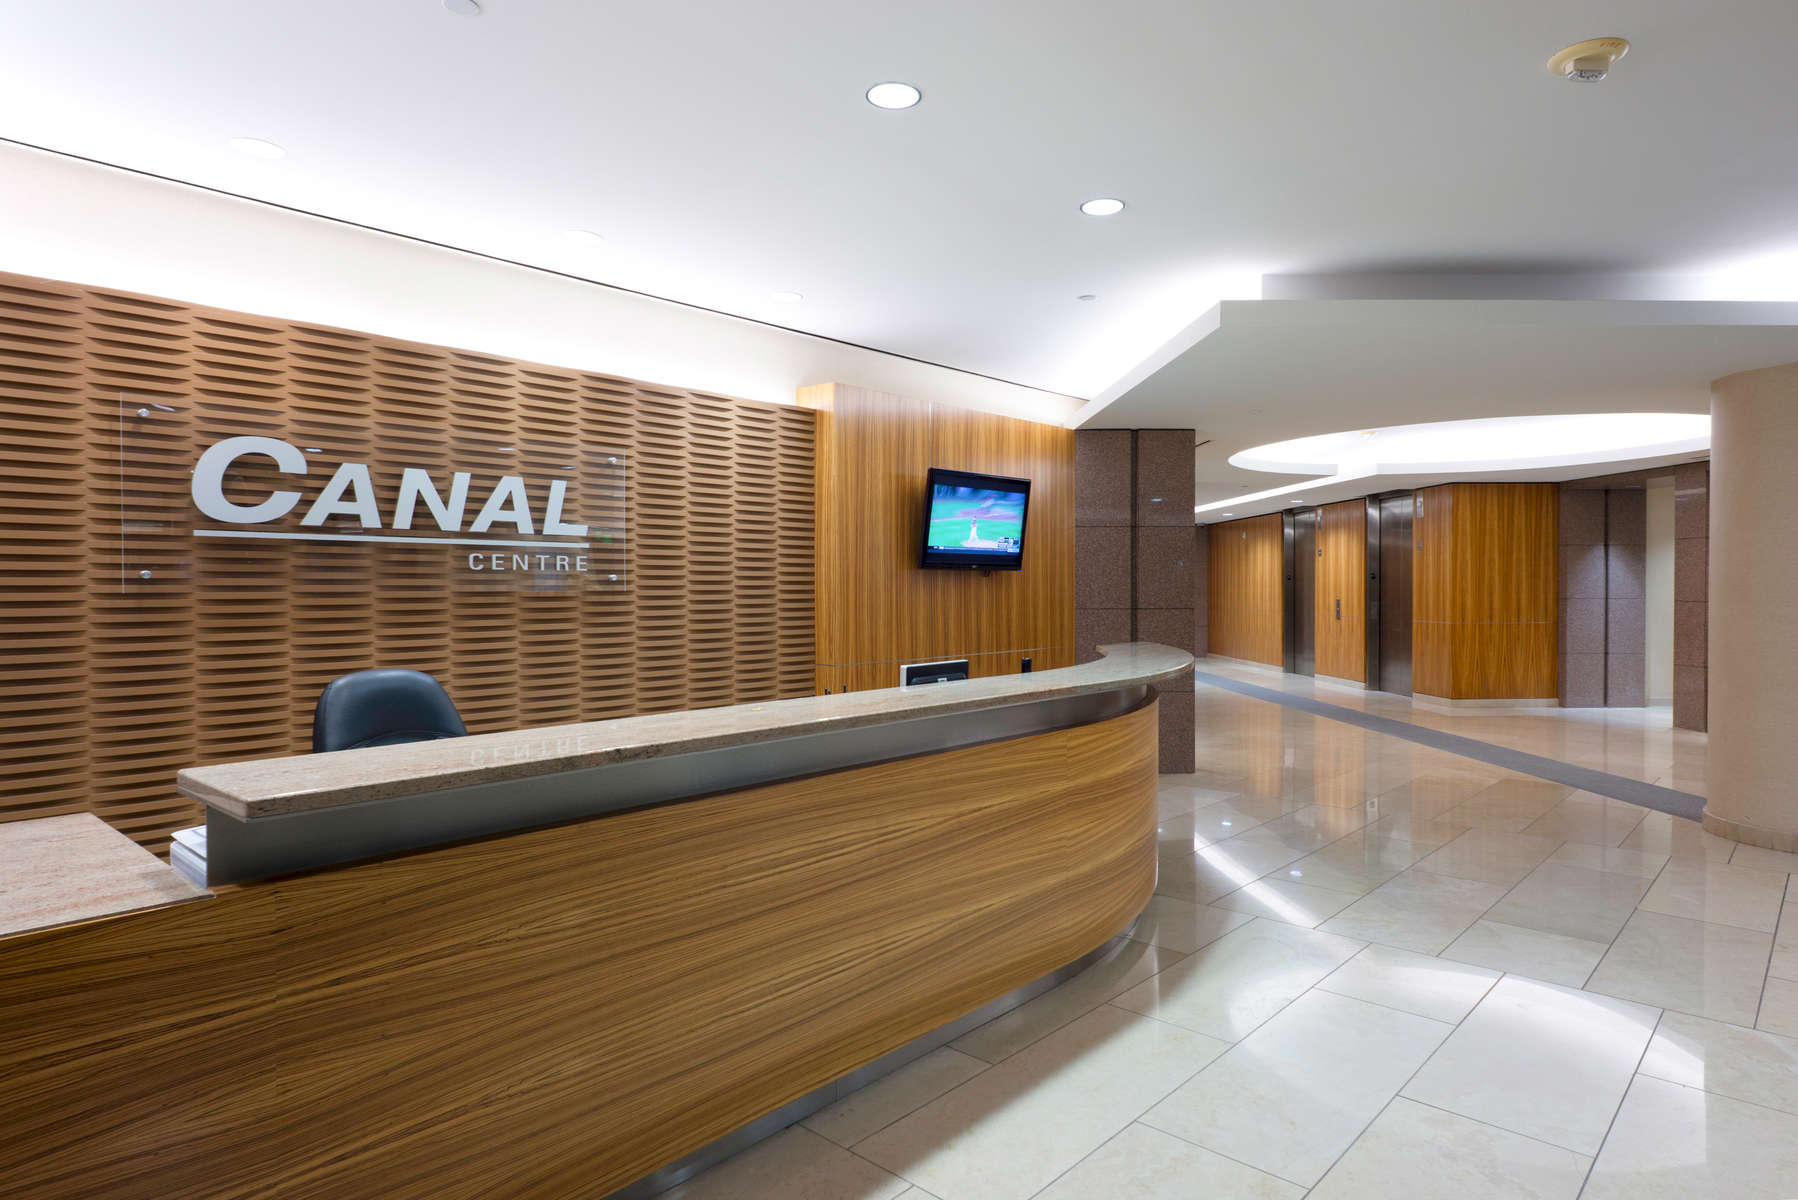 Canal-Center